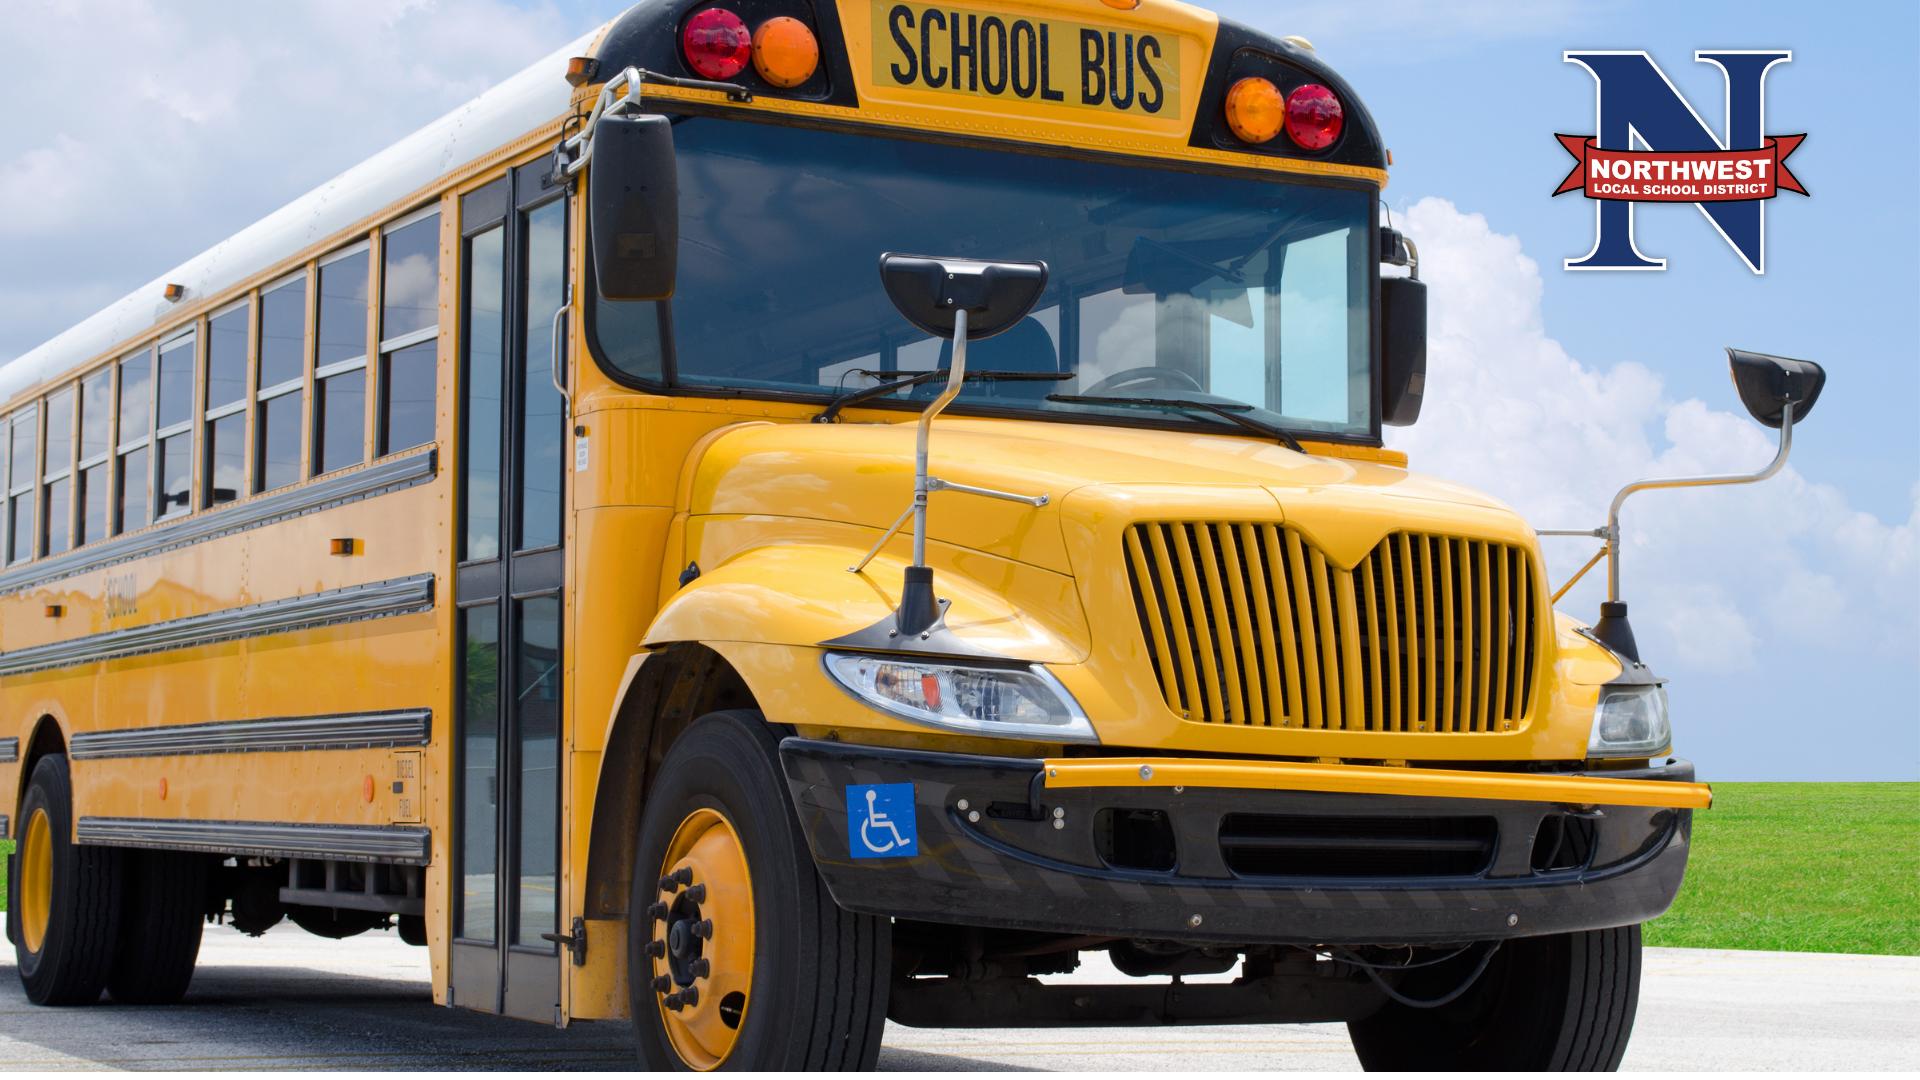 Northwest Local School District School Bus